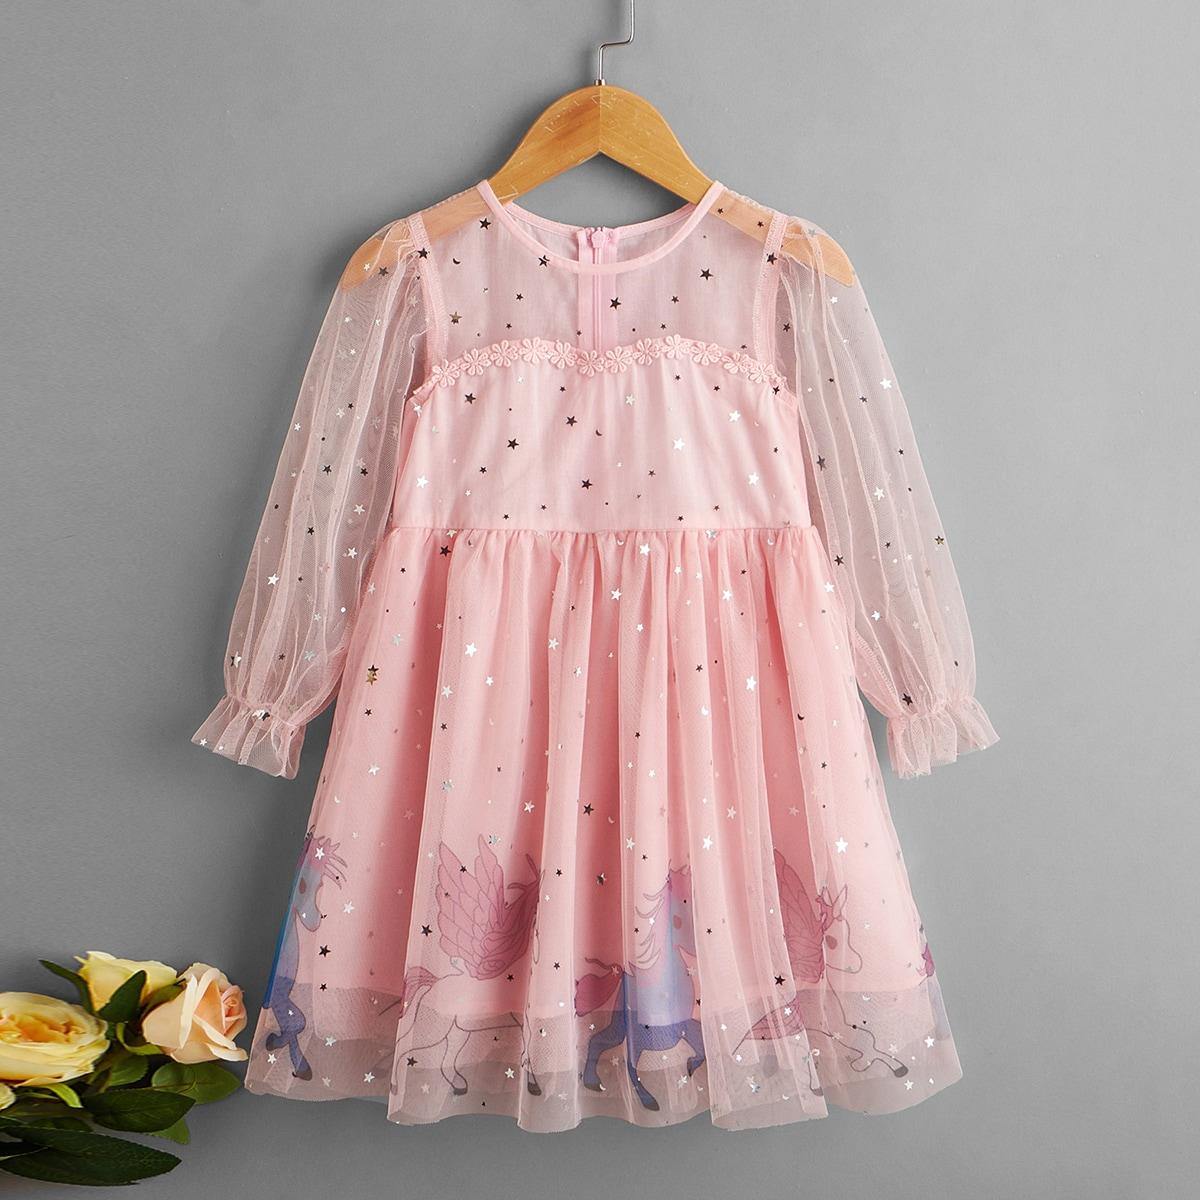 Toddler Girls Unicorn Pattern Flounce Sleeve Sequin Mesh Dress